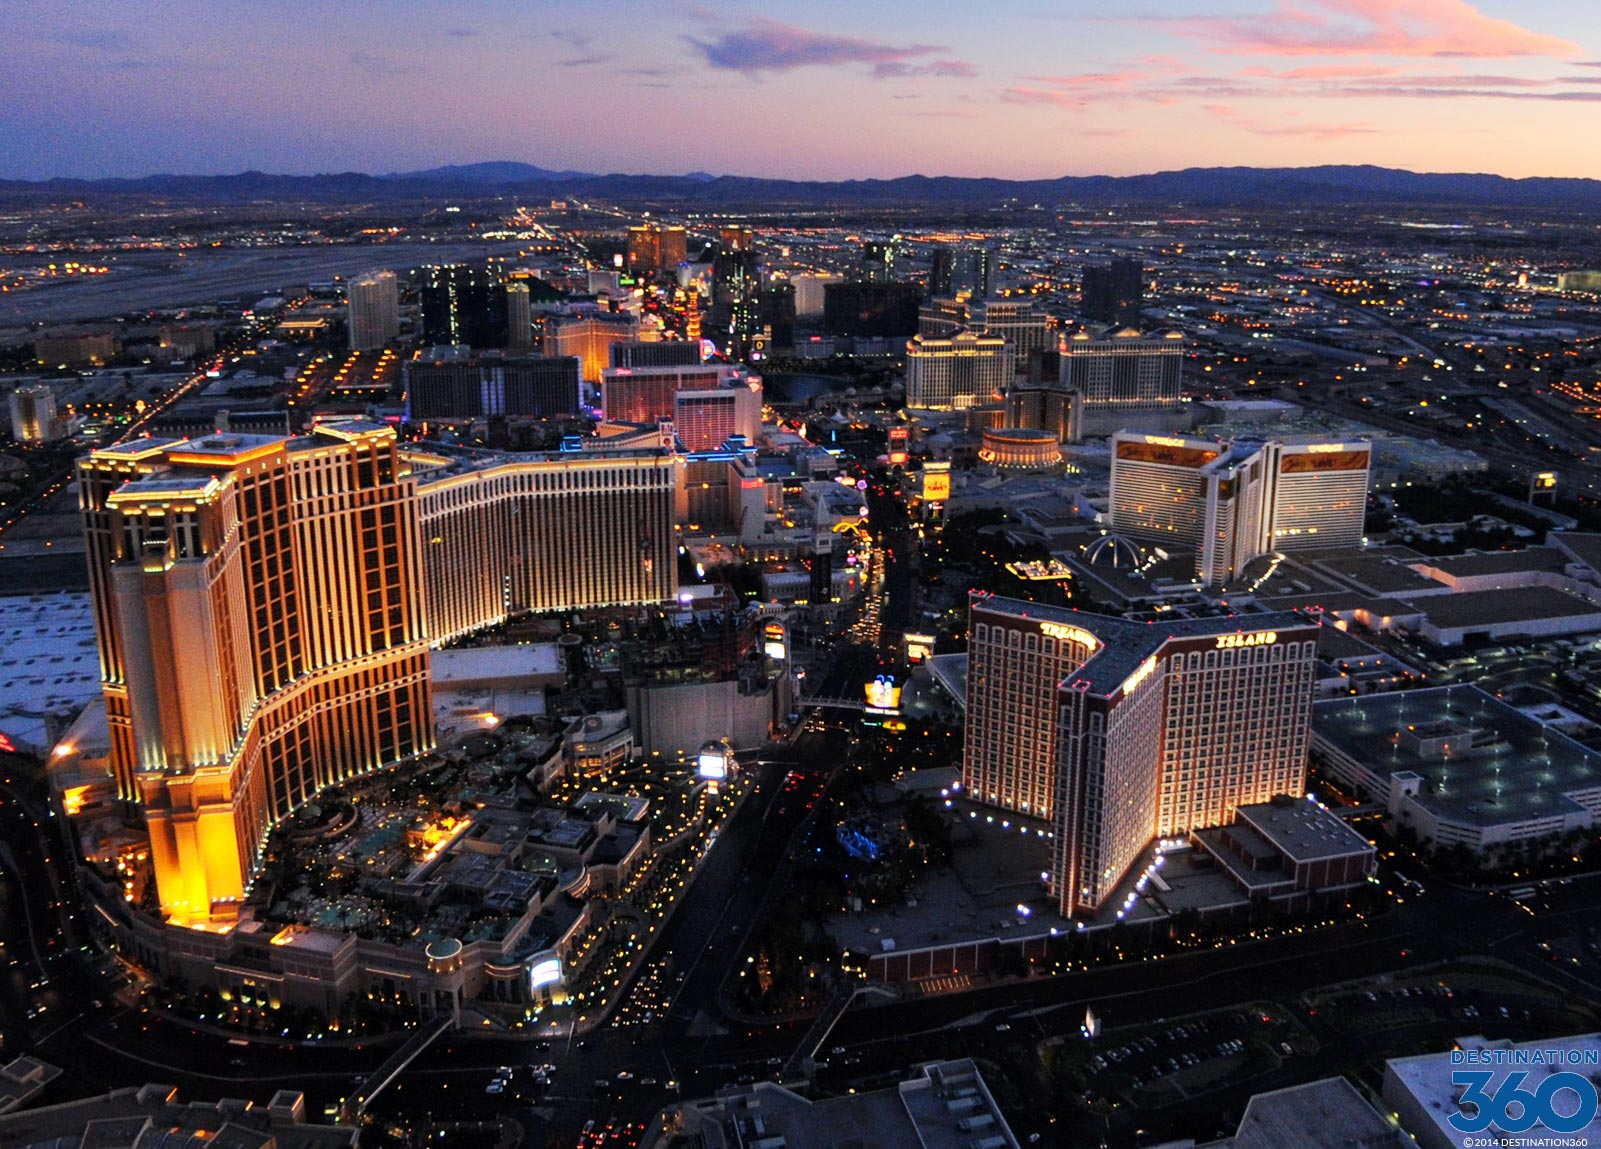 View From Stratosphere Las Vegas Stratosphere Las Vegas